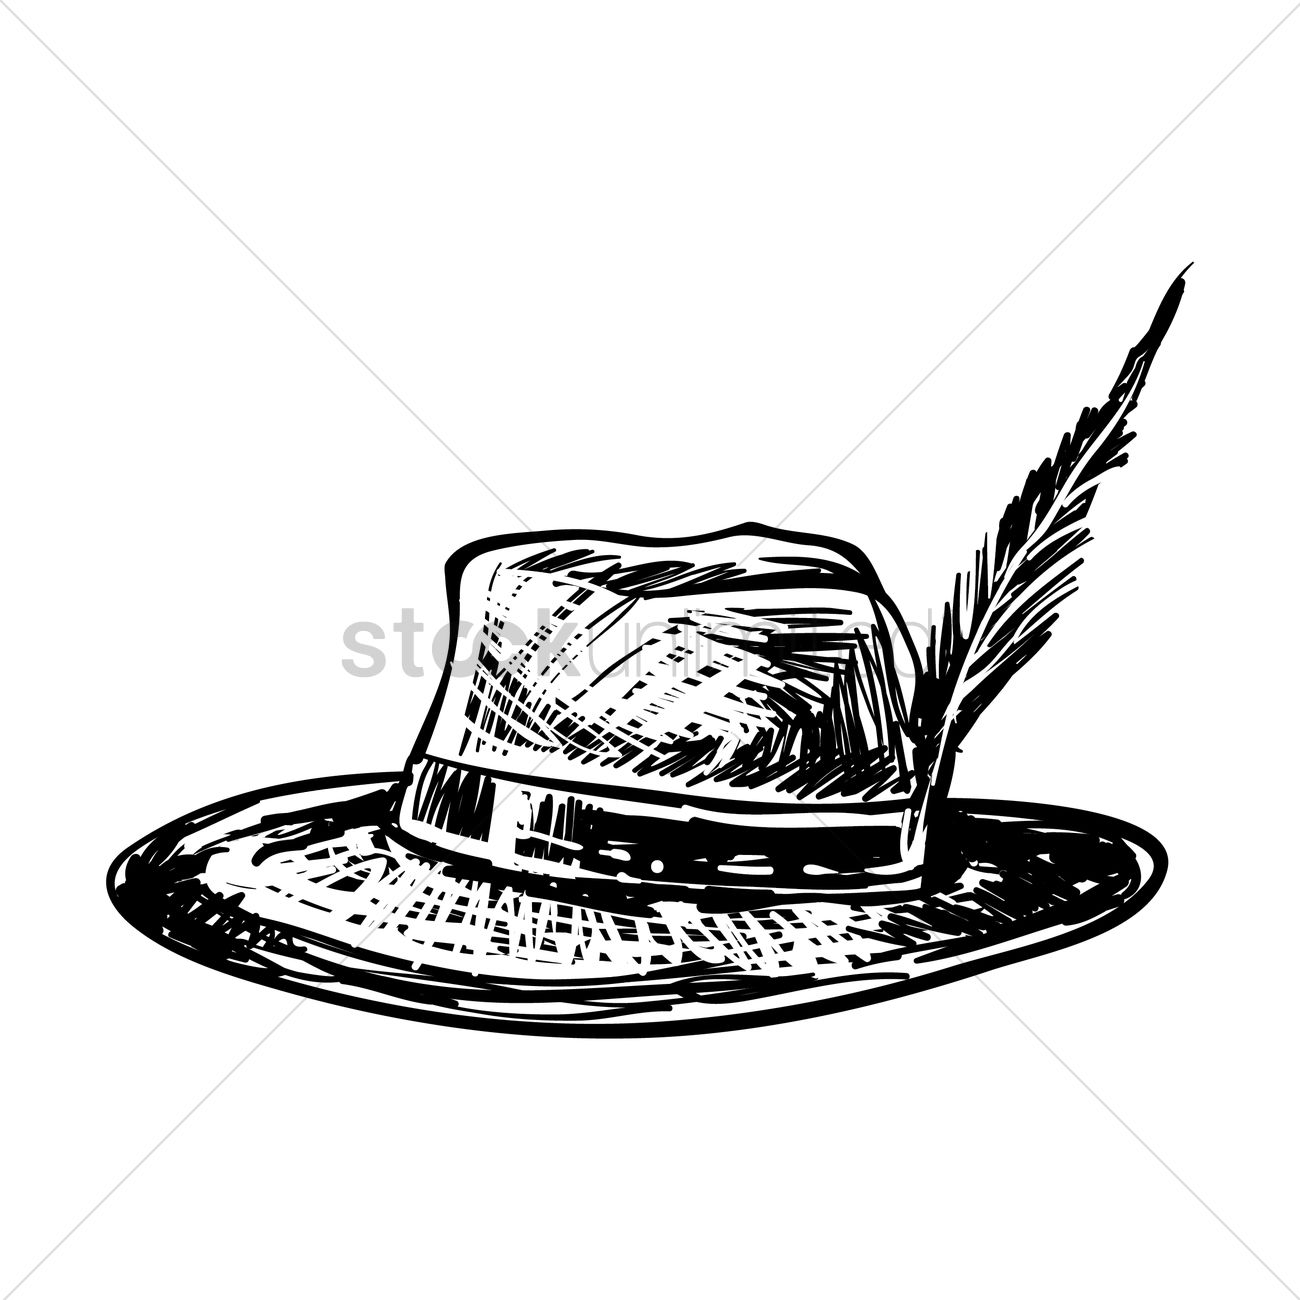 Alpine hat Vector Image - 1977004 | StockUnlimited